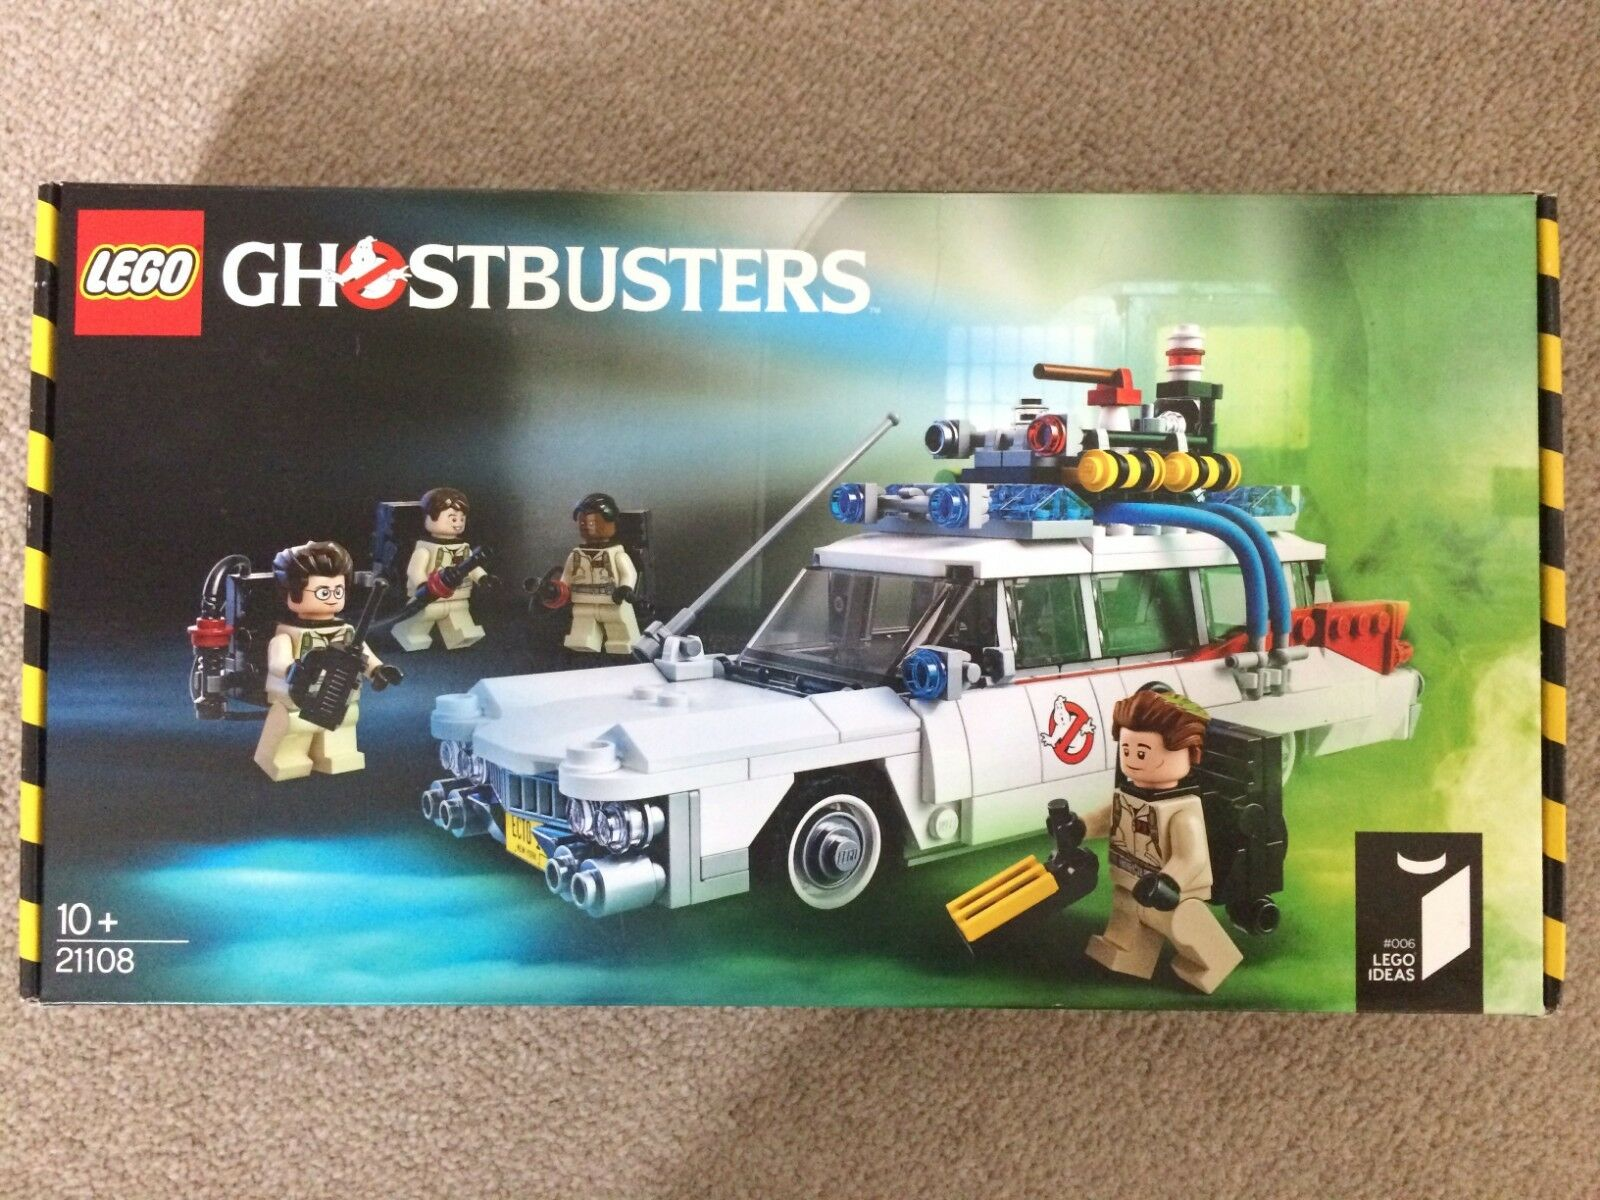 Neuf dans sa boîte  Real  LEGO Ghostbusters Ecto - 1 & Figures Set - 21108